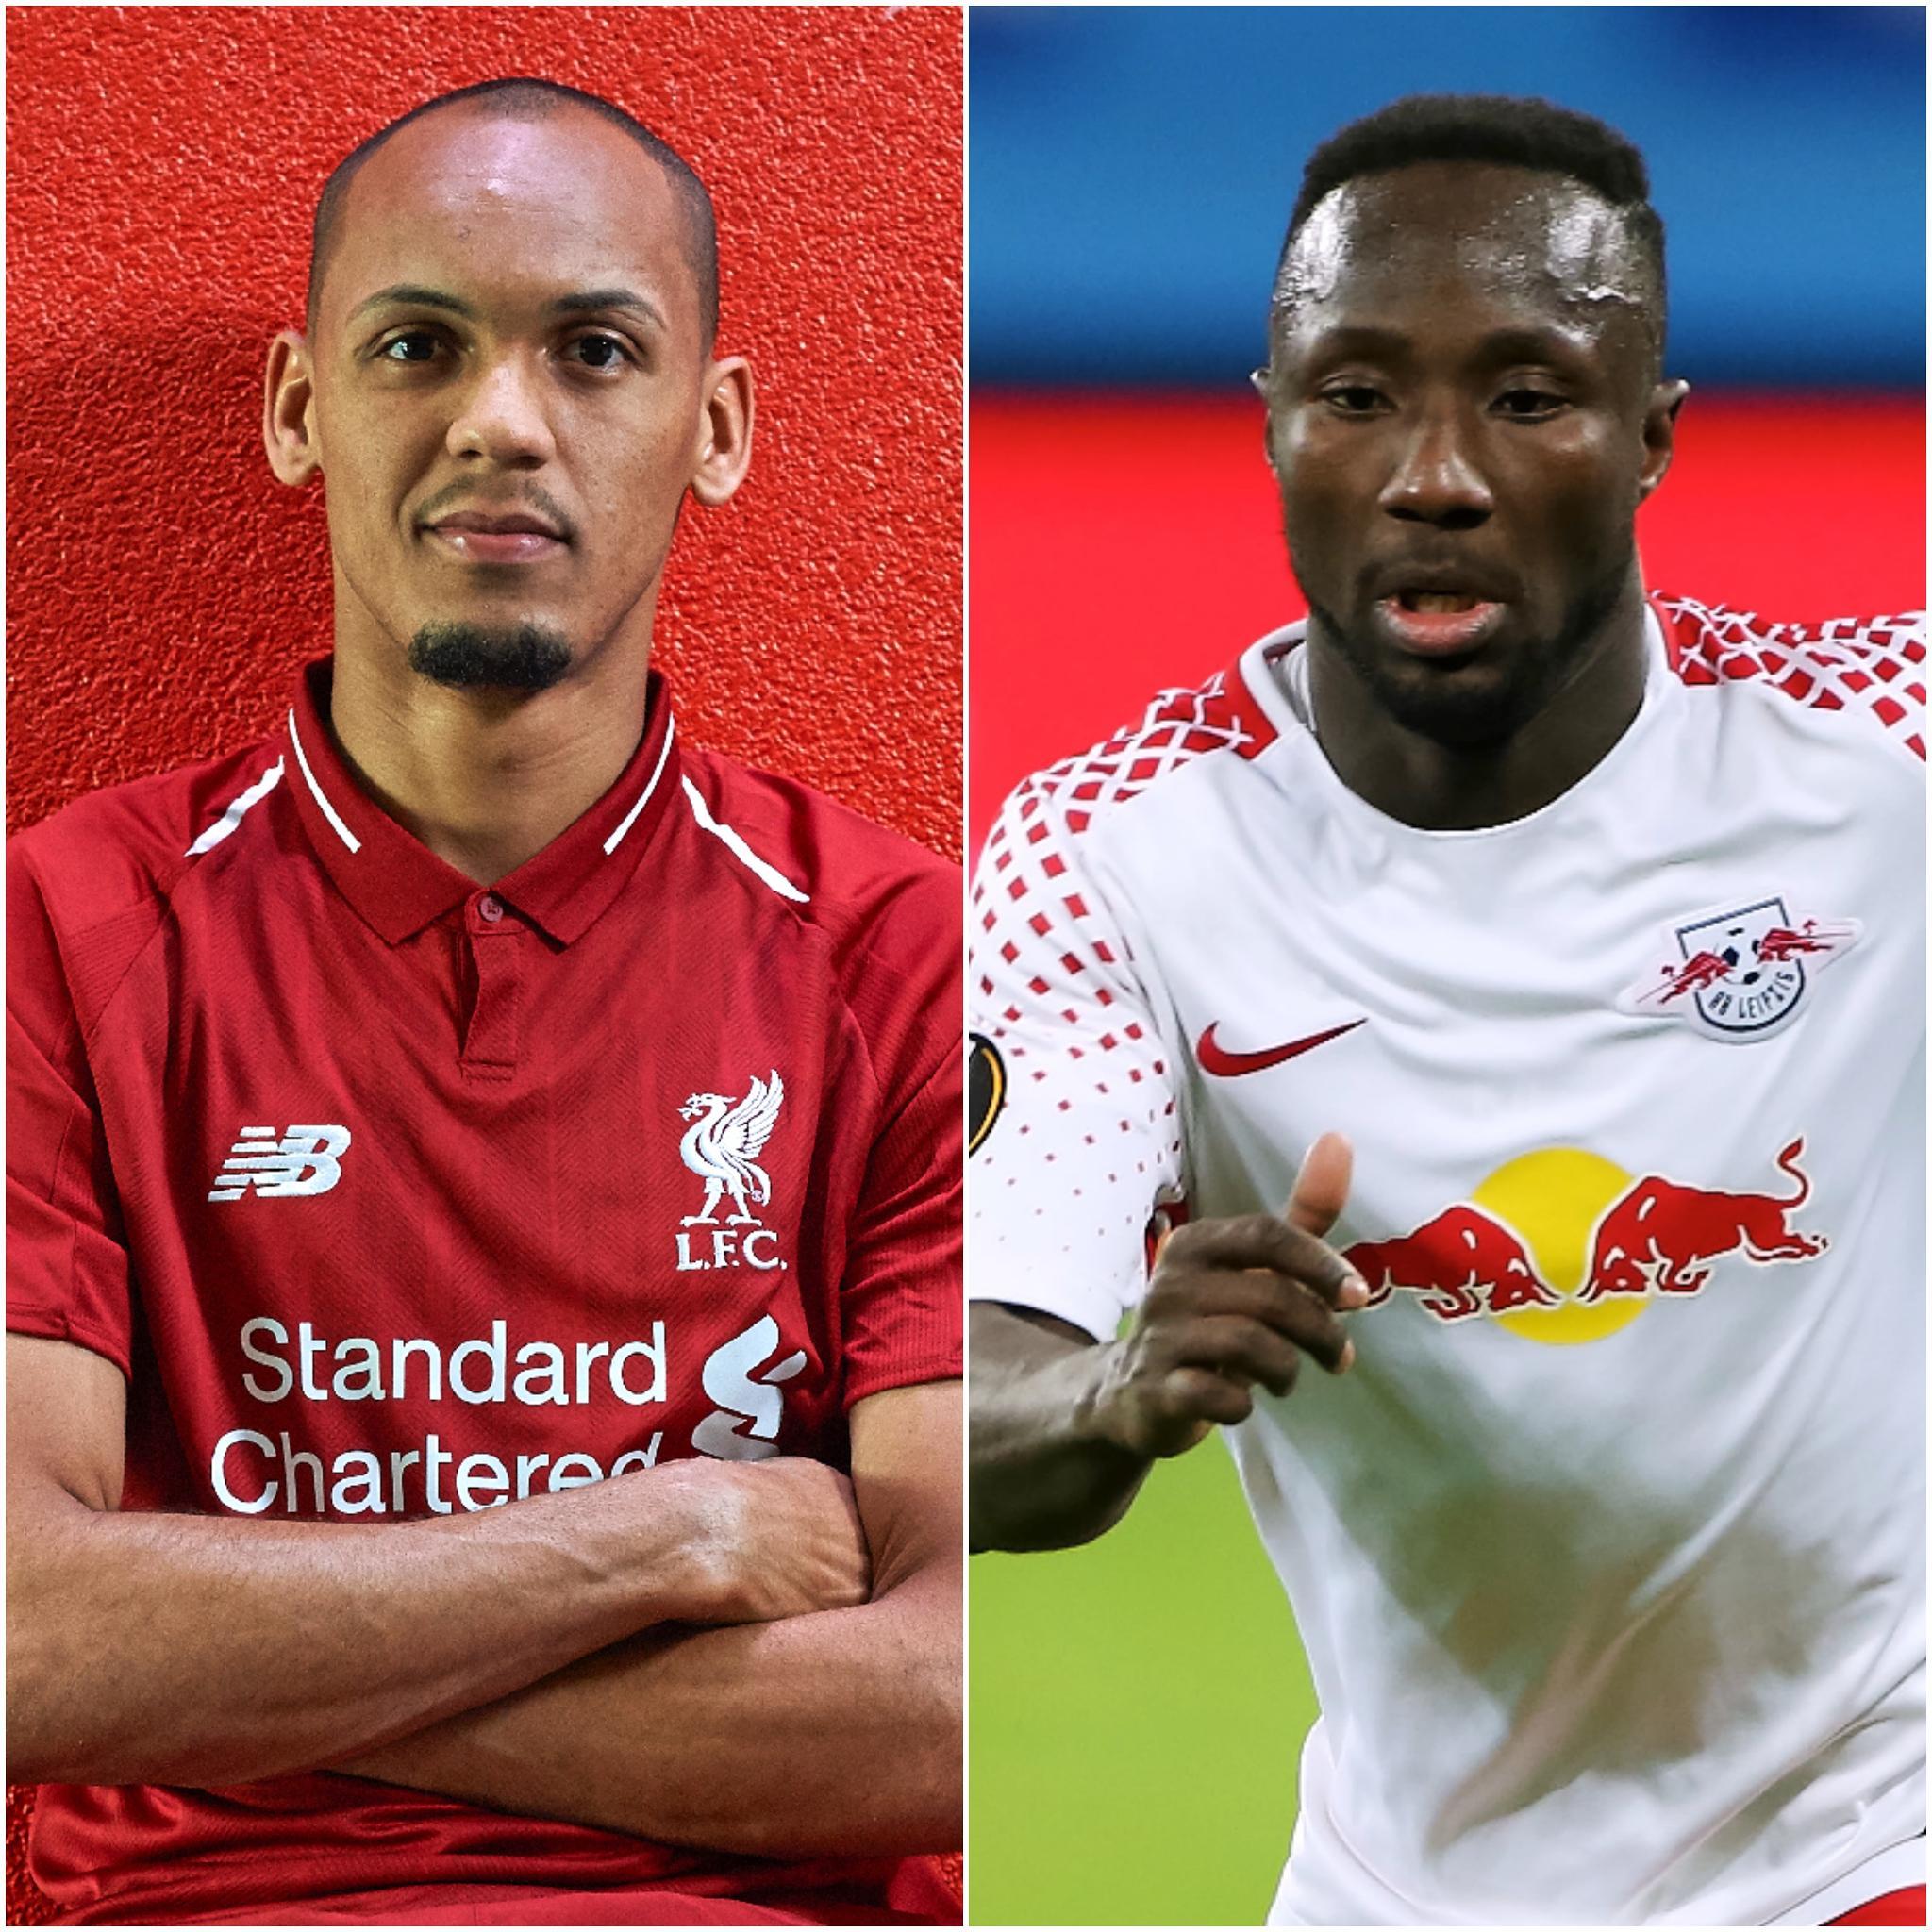 Fabinho & Keita  Box-to-box midfielders, but who will adapt to #PL life the quickest?   ➡️ https://t.co/QBcKLKMSvq https://t.co/0I0TbZkogg